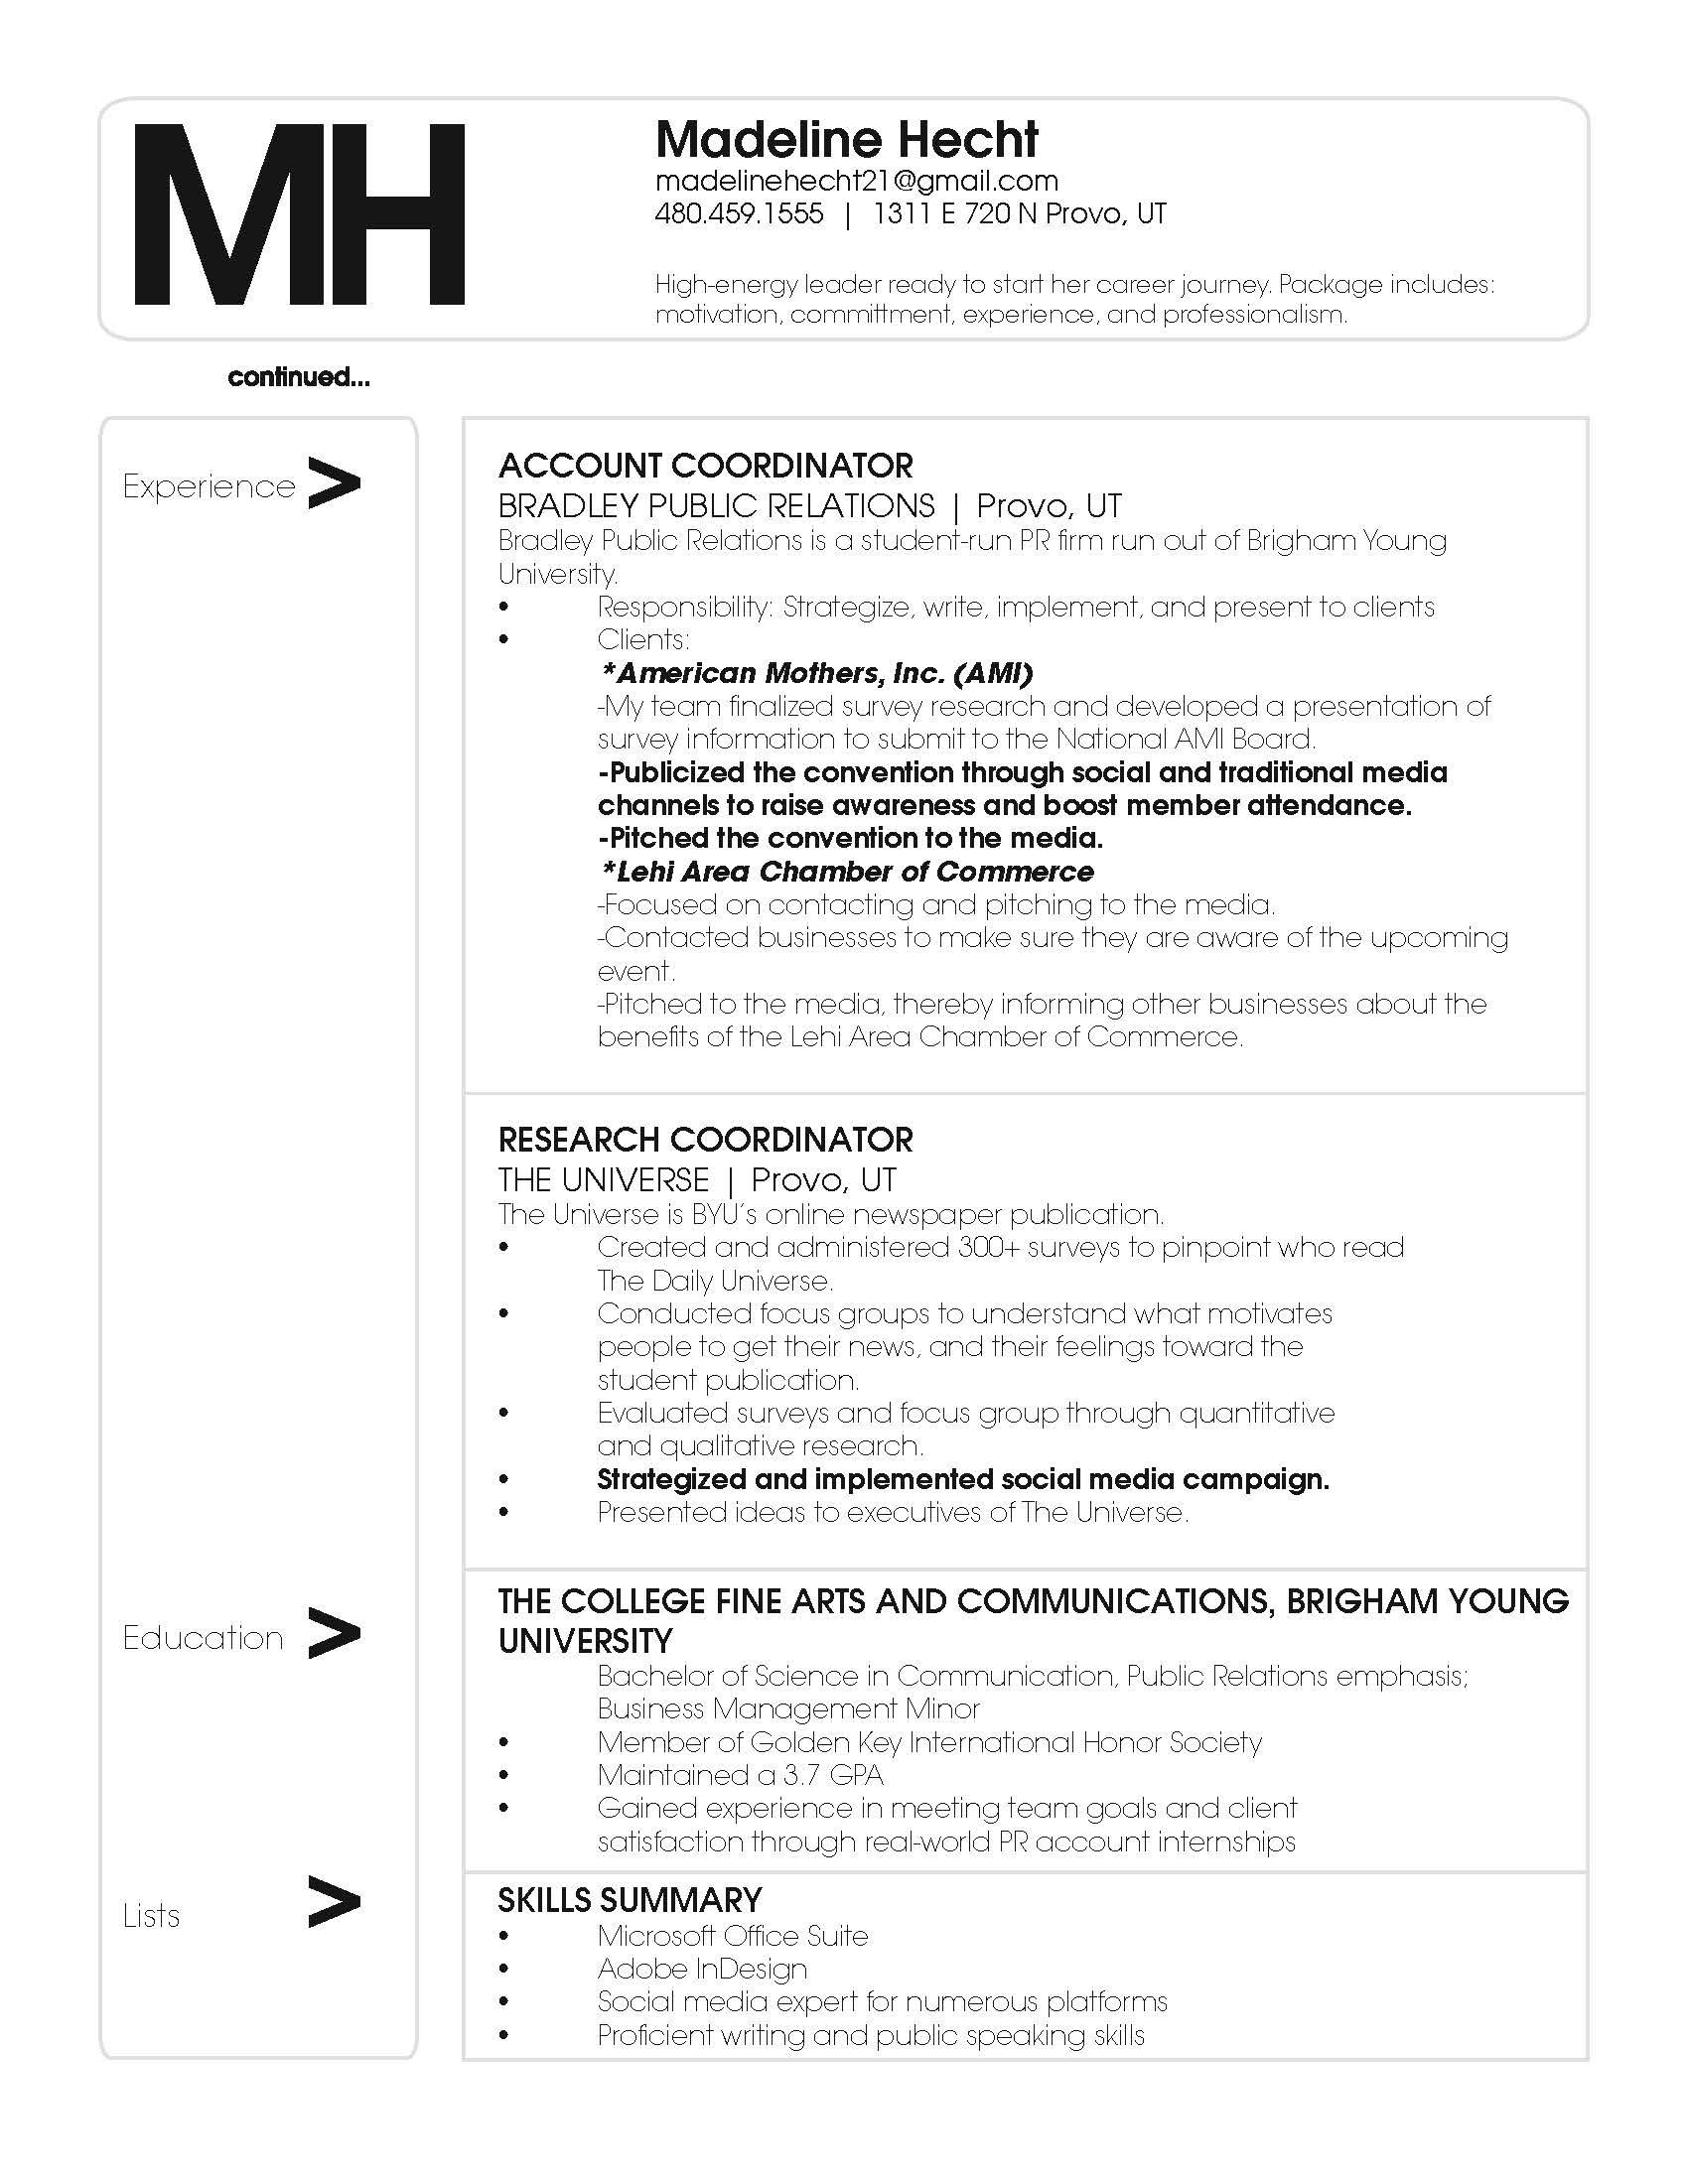 Public Relations Internship Cover Letter - Cover Letter Resume Ideas ...